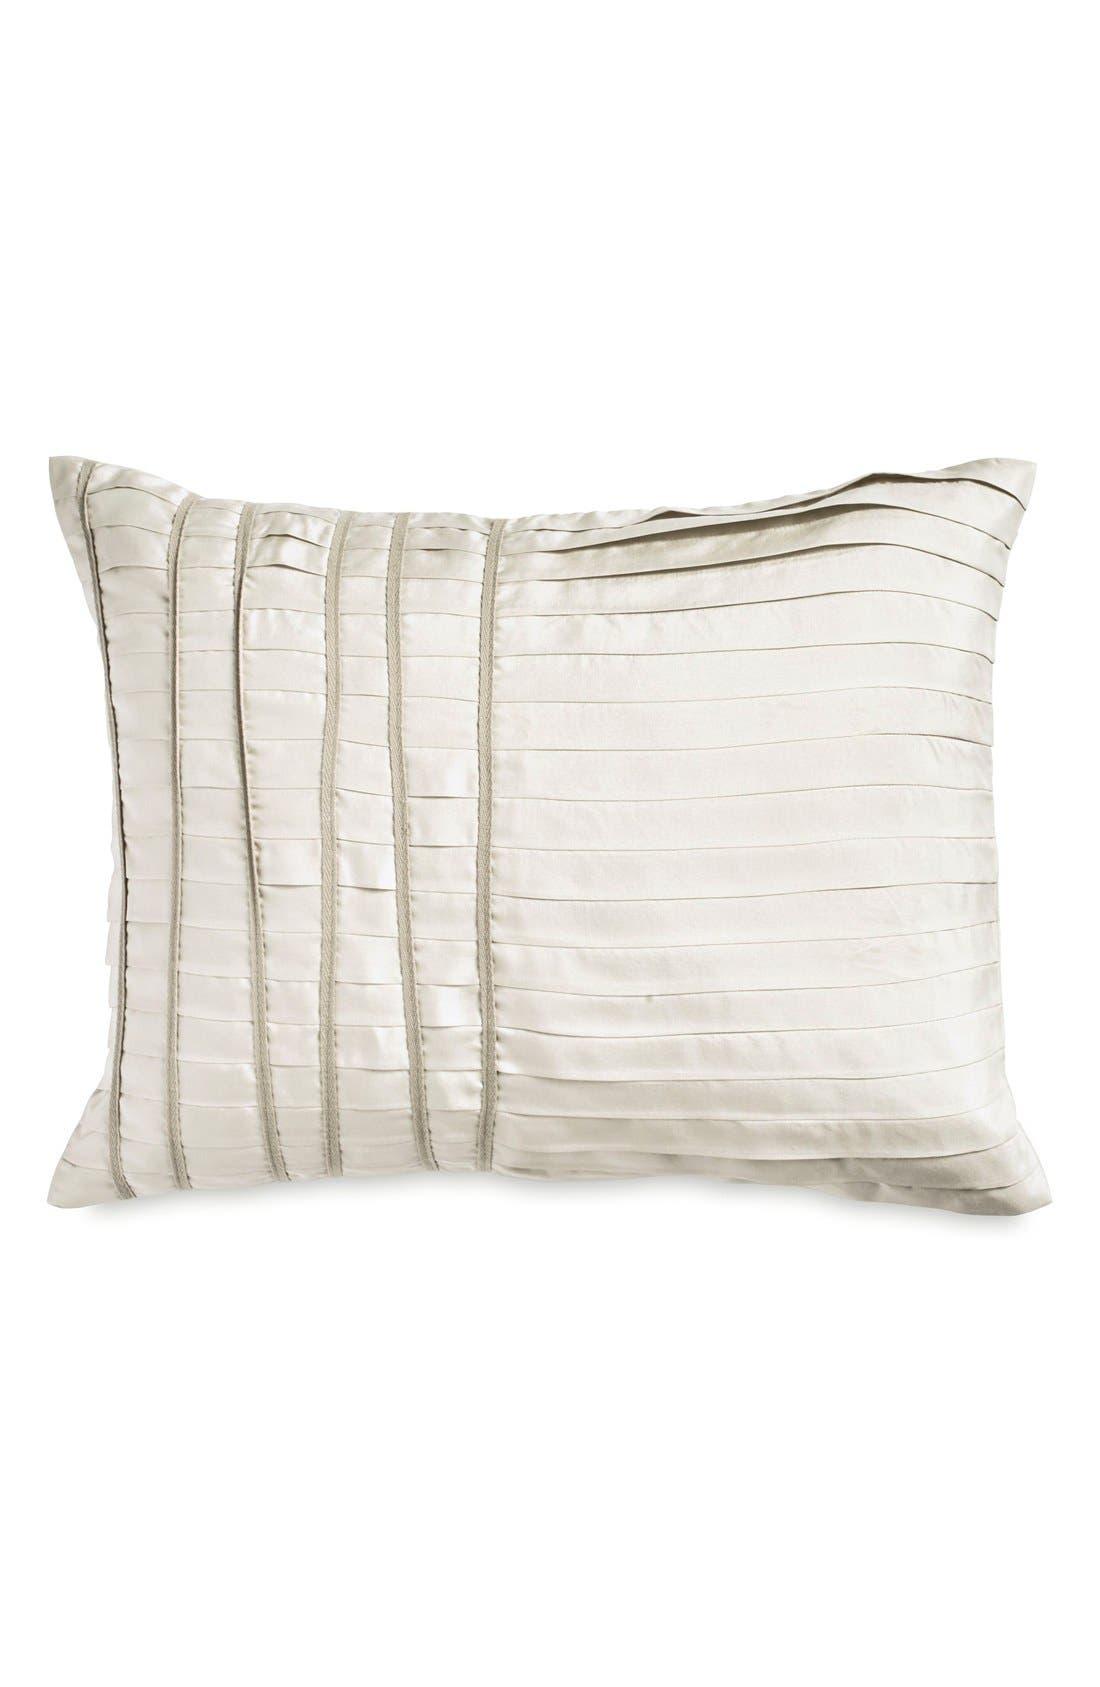 Donna Karan Collection 'Silk Essentials' Pillow,                             Main thumbnail 1, color,                             Pearl